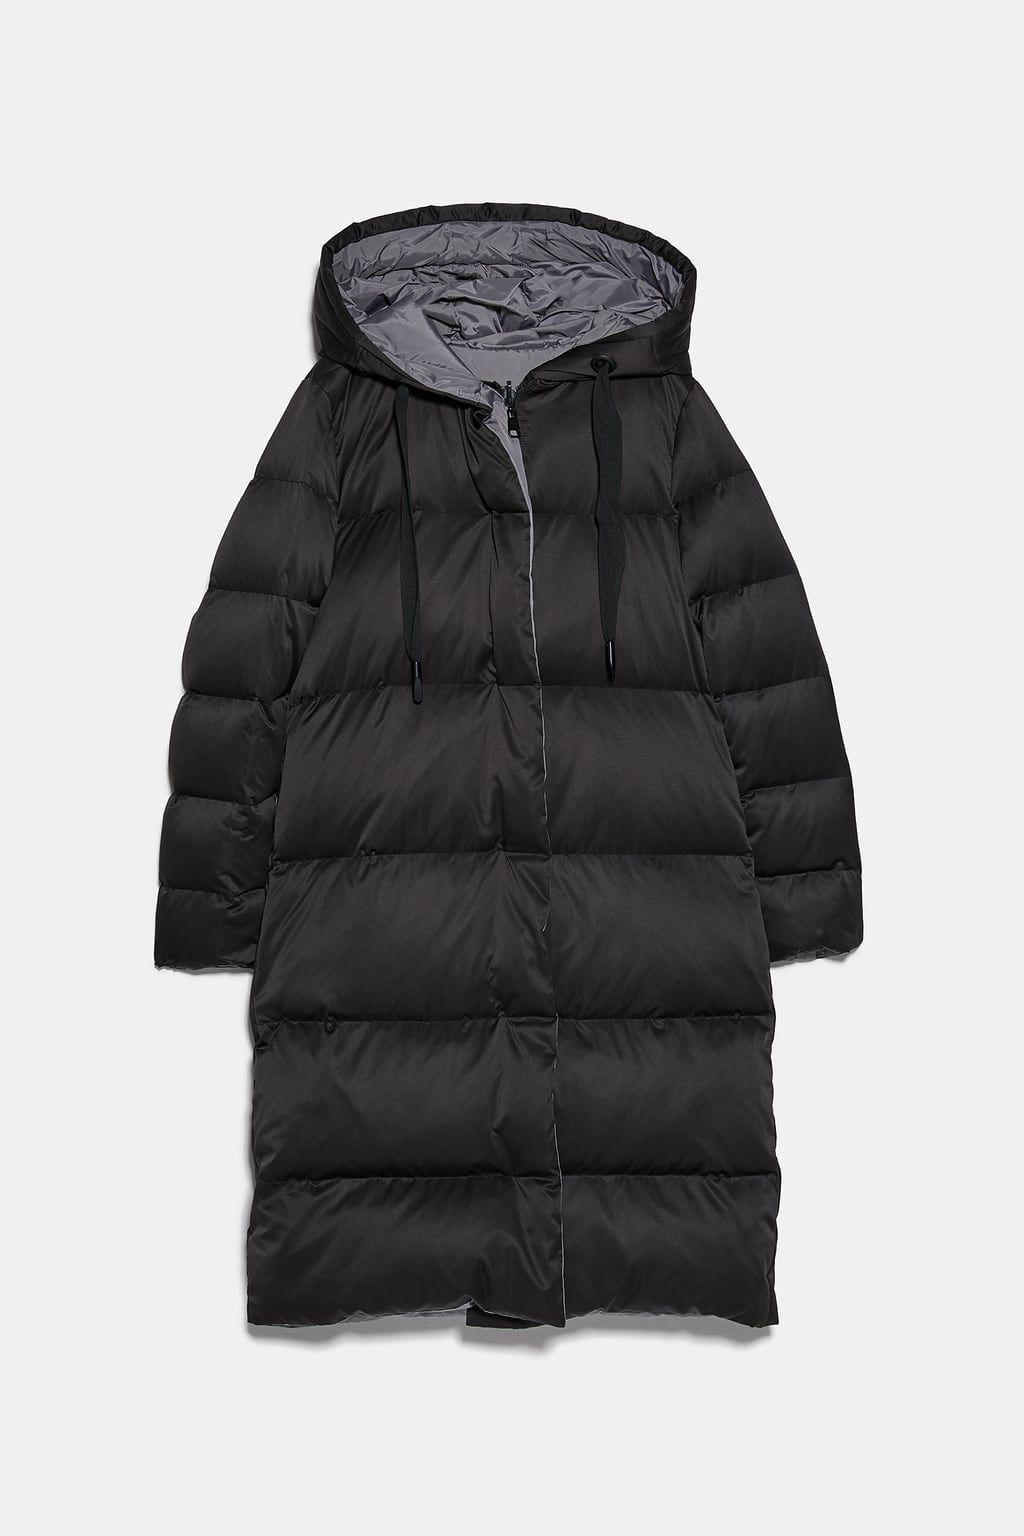 Zara Reversible Down Jacket